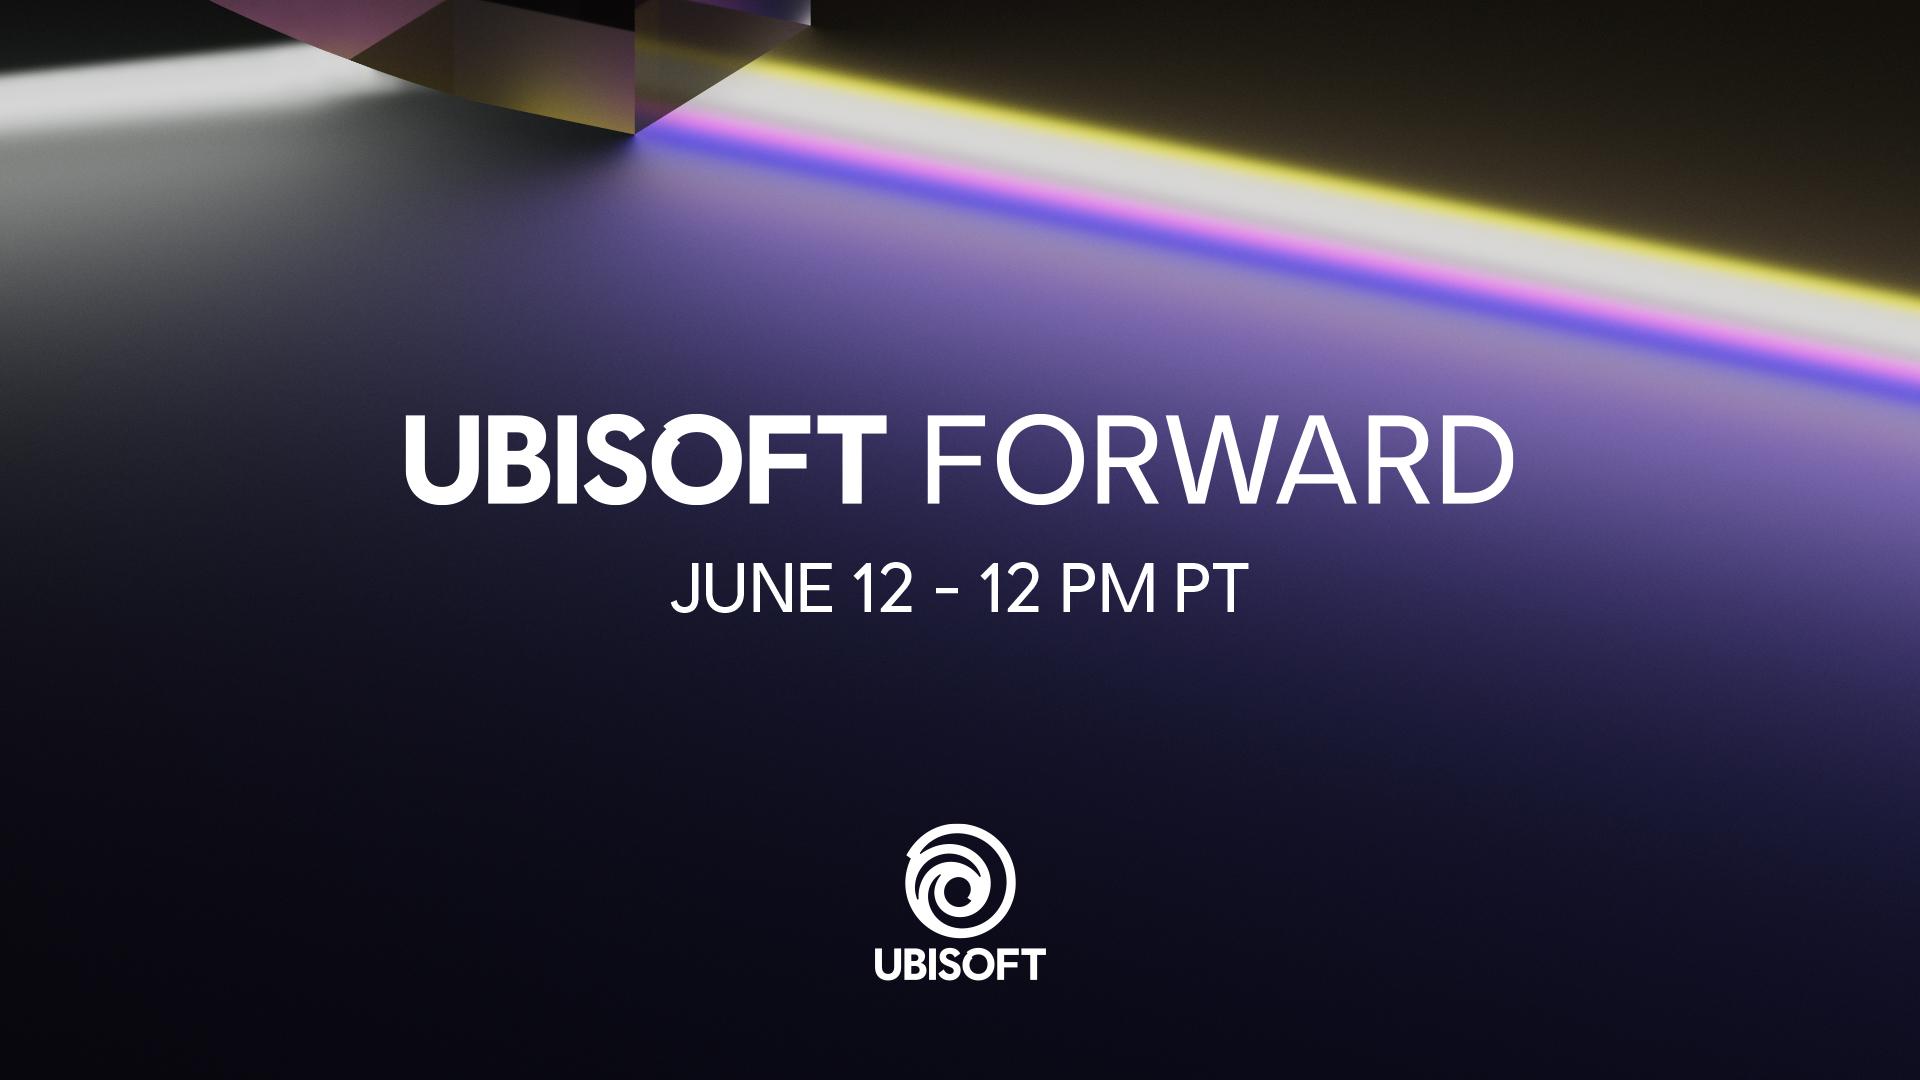 Ubisoft locks in next Forward for E3 2021 screenshot